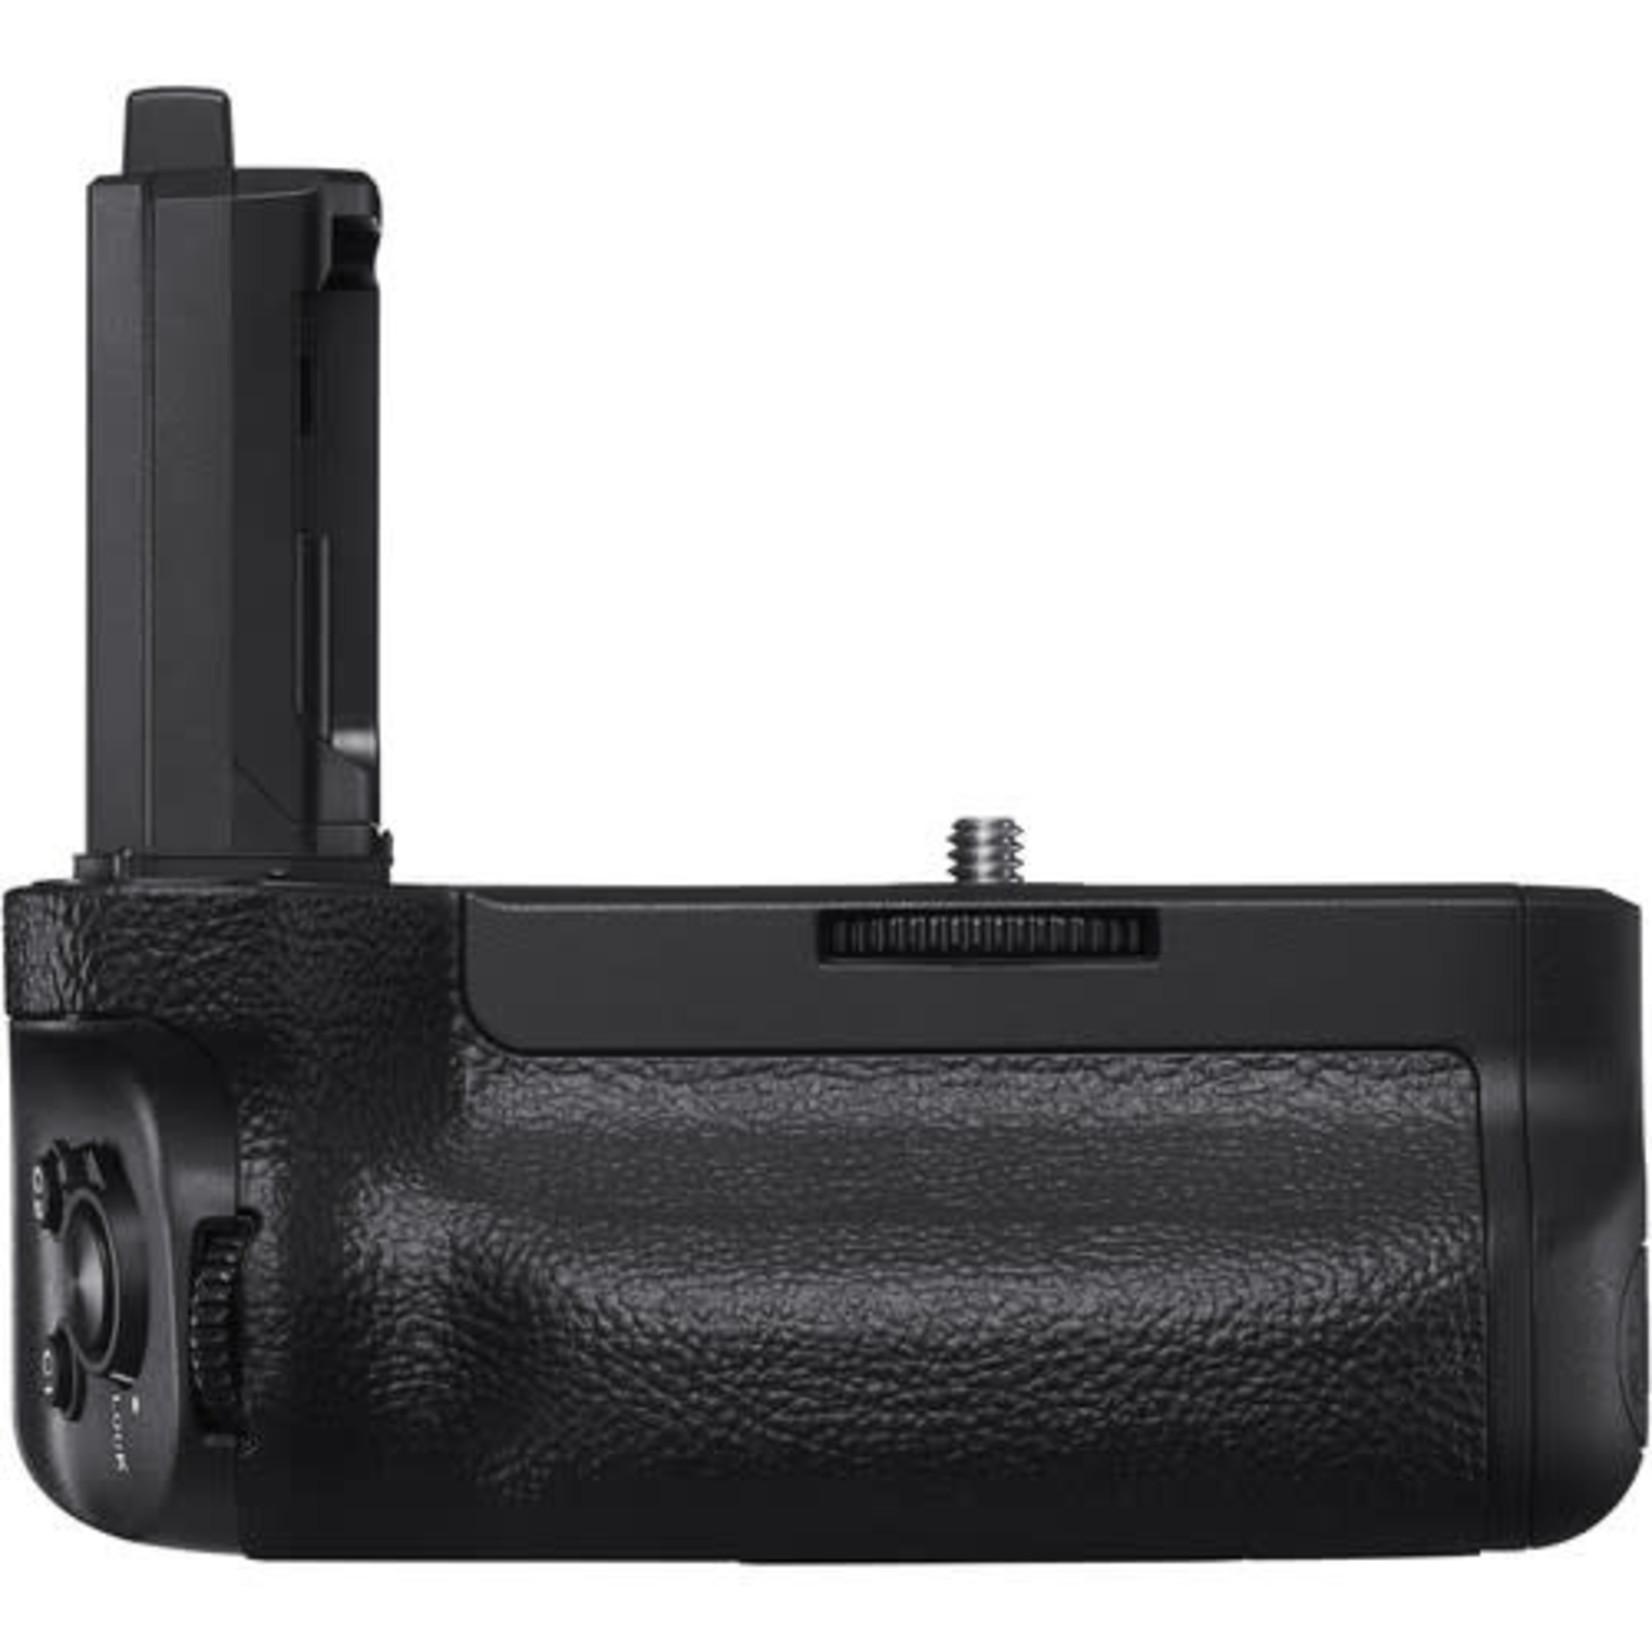 Sony Sony VG-C4EM Vertical Grip